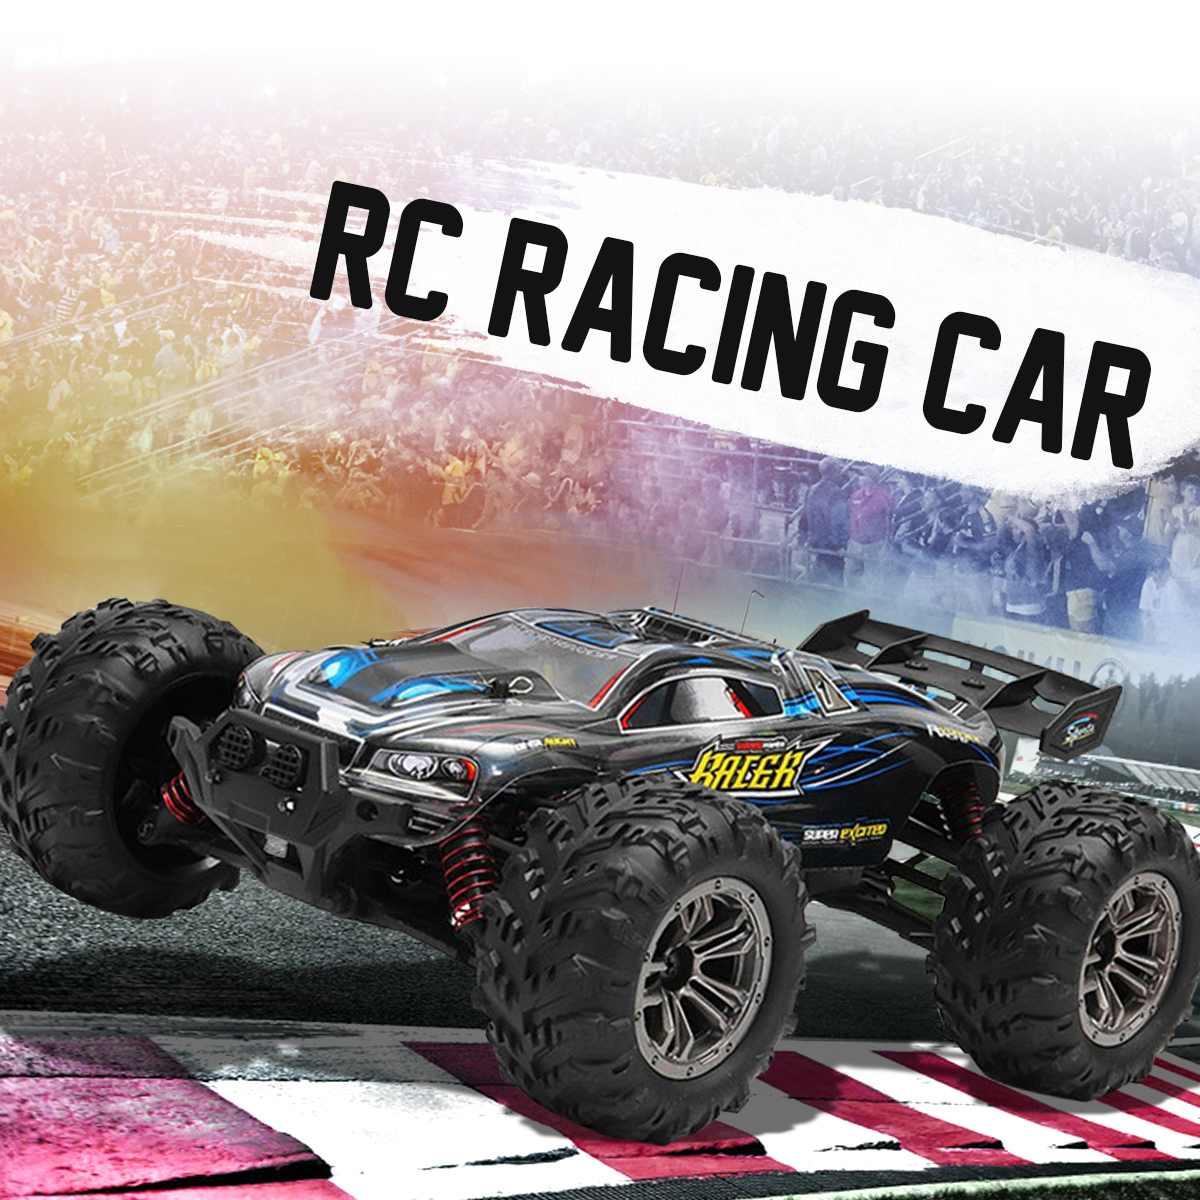 Xinlehong 9136 1:16 2.4G 4WD 32cm Rc Racing Cars 36km/h Bigfoot Off-road Truck Vehicle RTR Toy VS XINLEHONG 9125 Gifts Boy